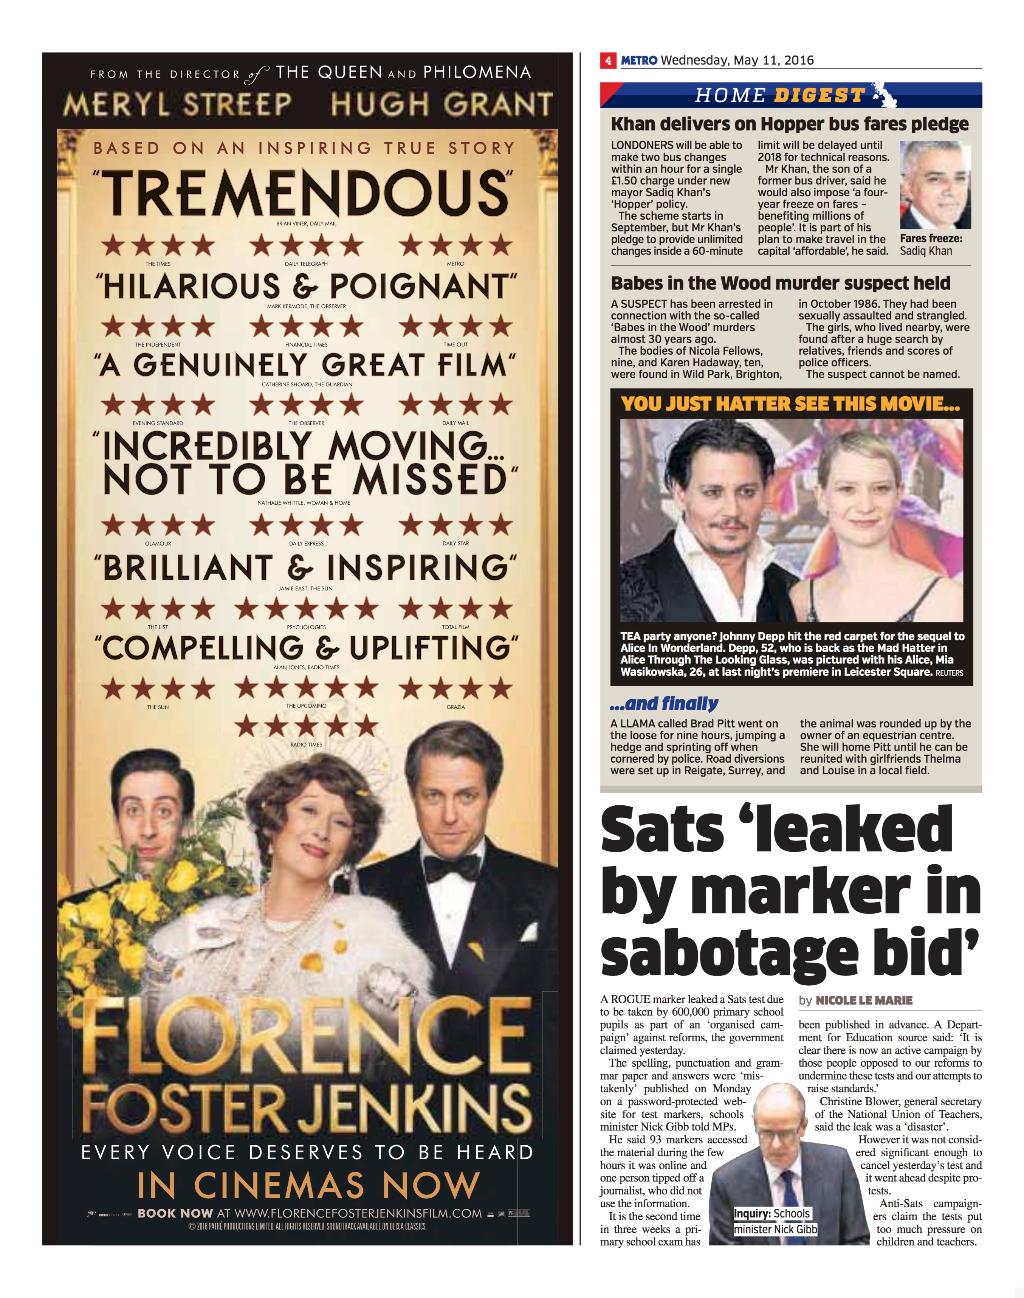 Metro - 11 May - Florence Foster Jenkins rating